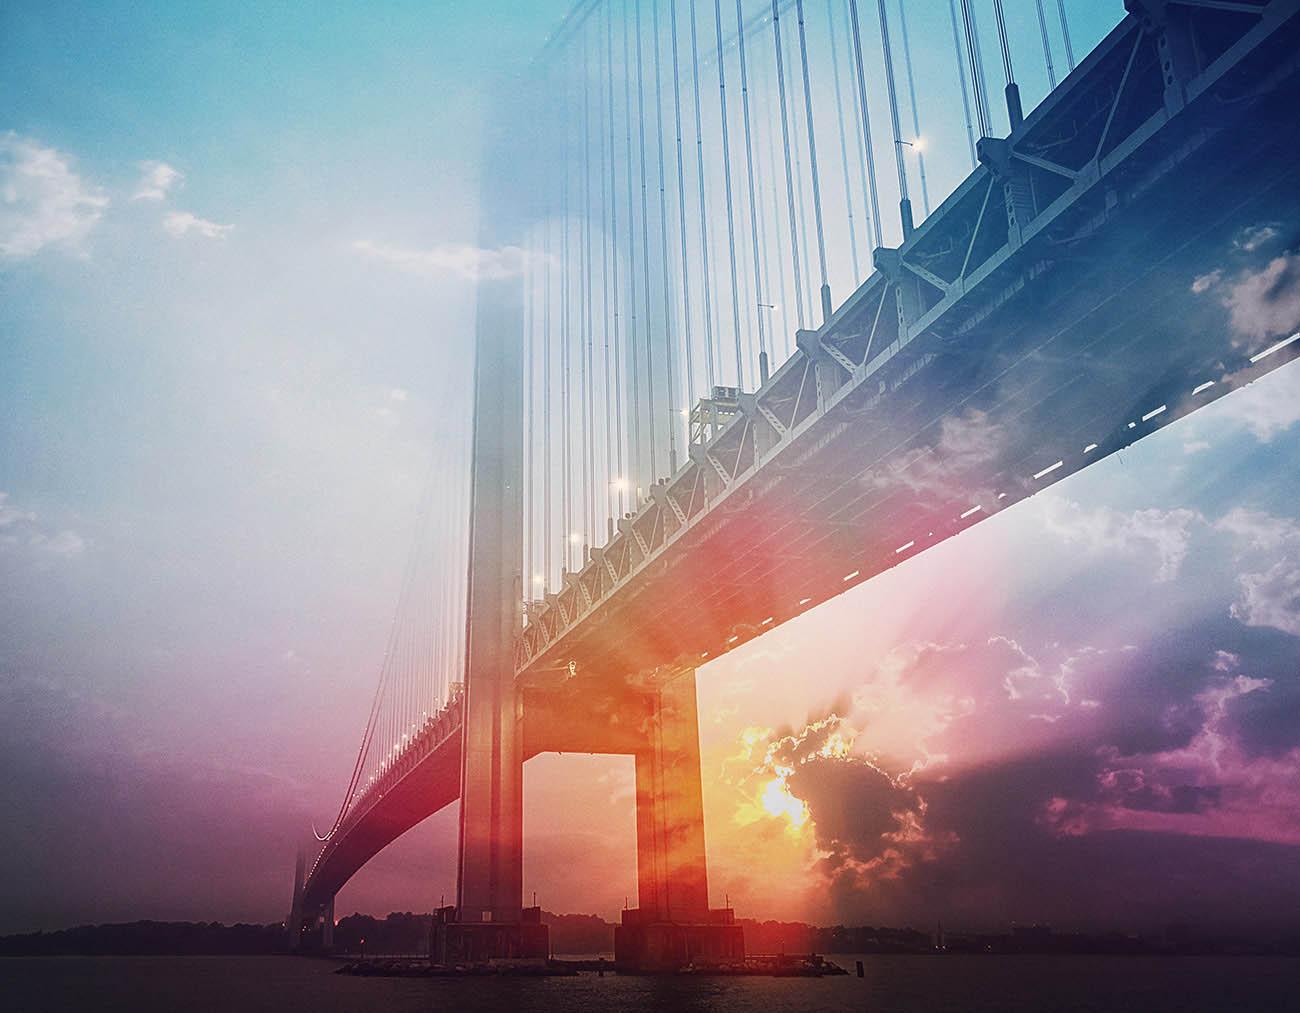 Surreal Suspension Bridge 01 - Royalty-Free Stock Imagery